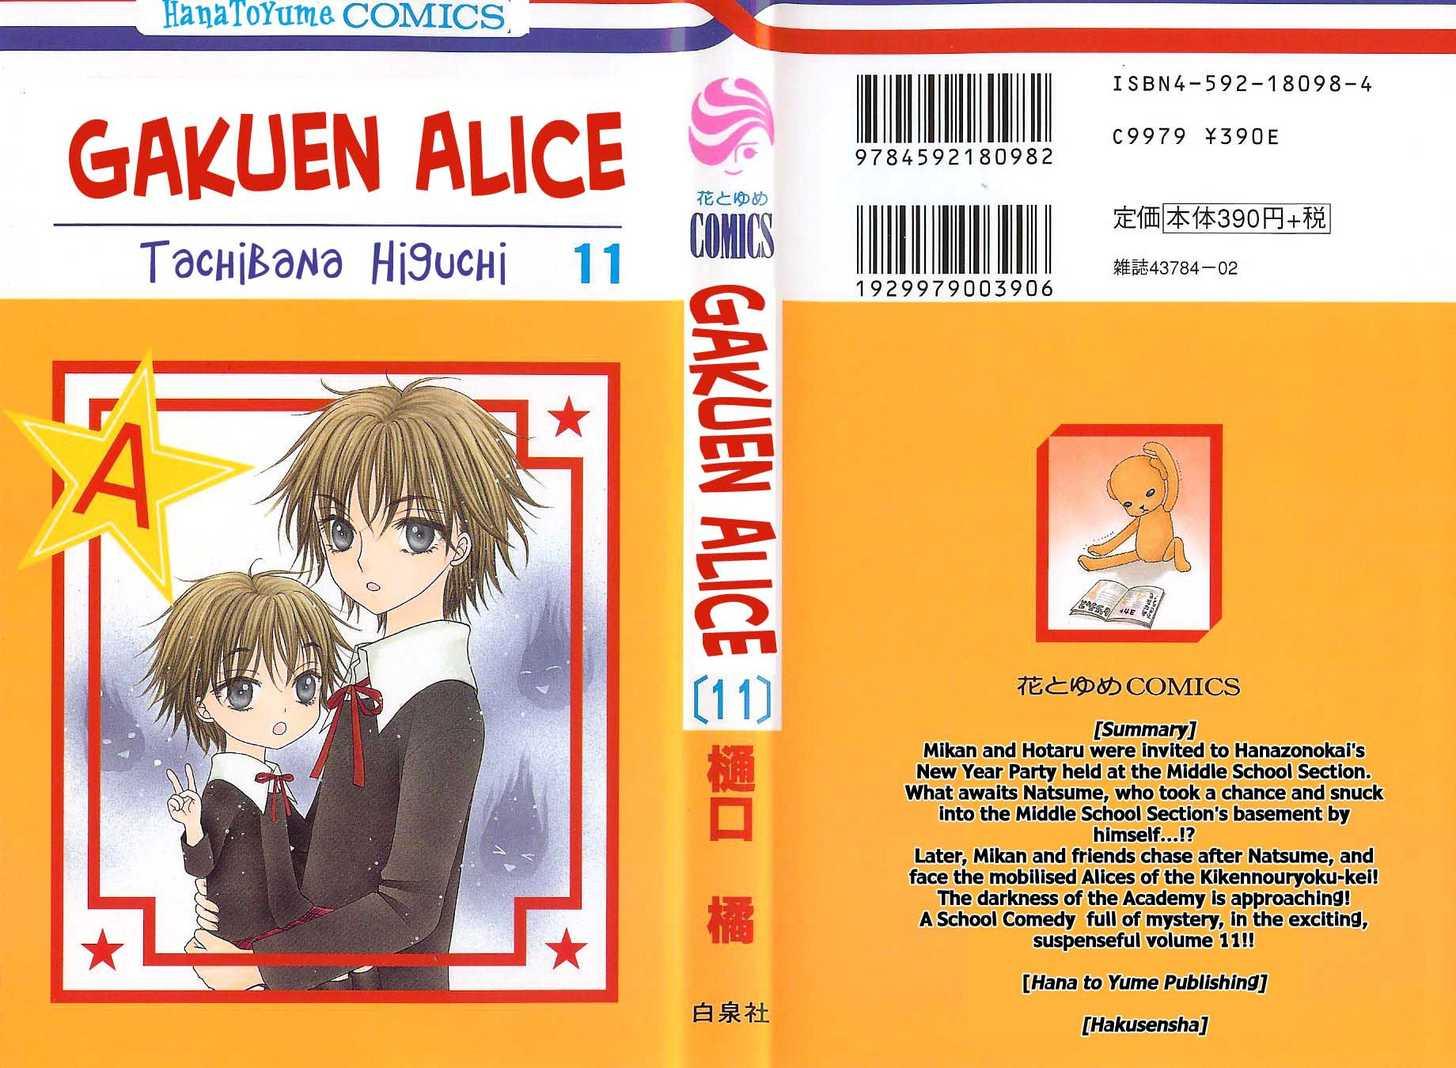 Gakuen Alice 59 Page 2